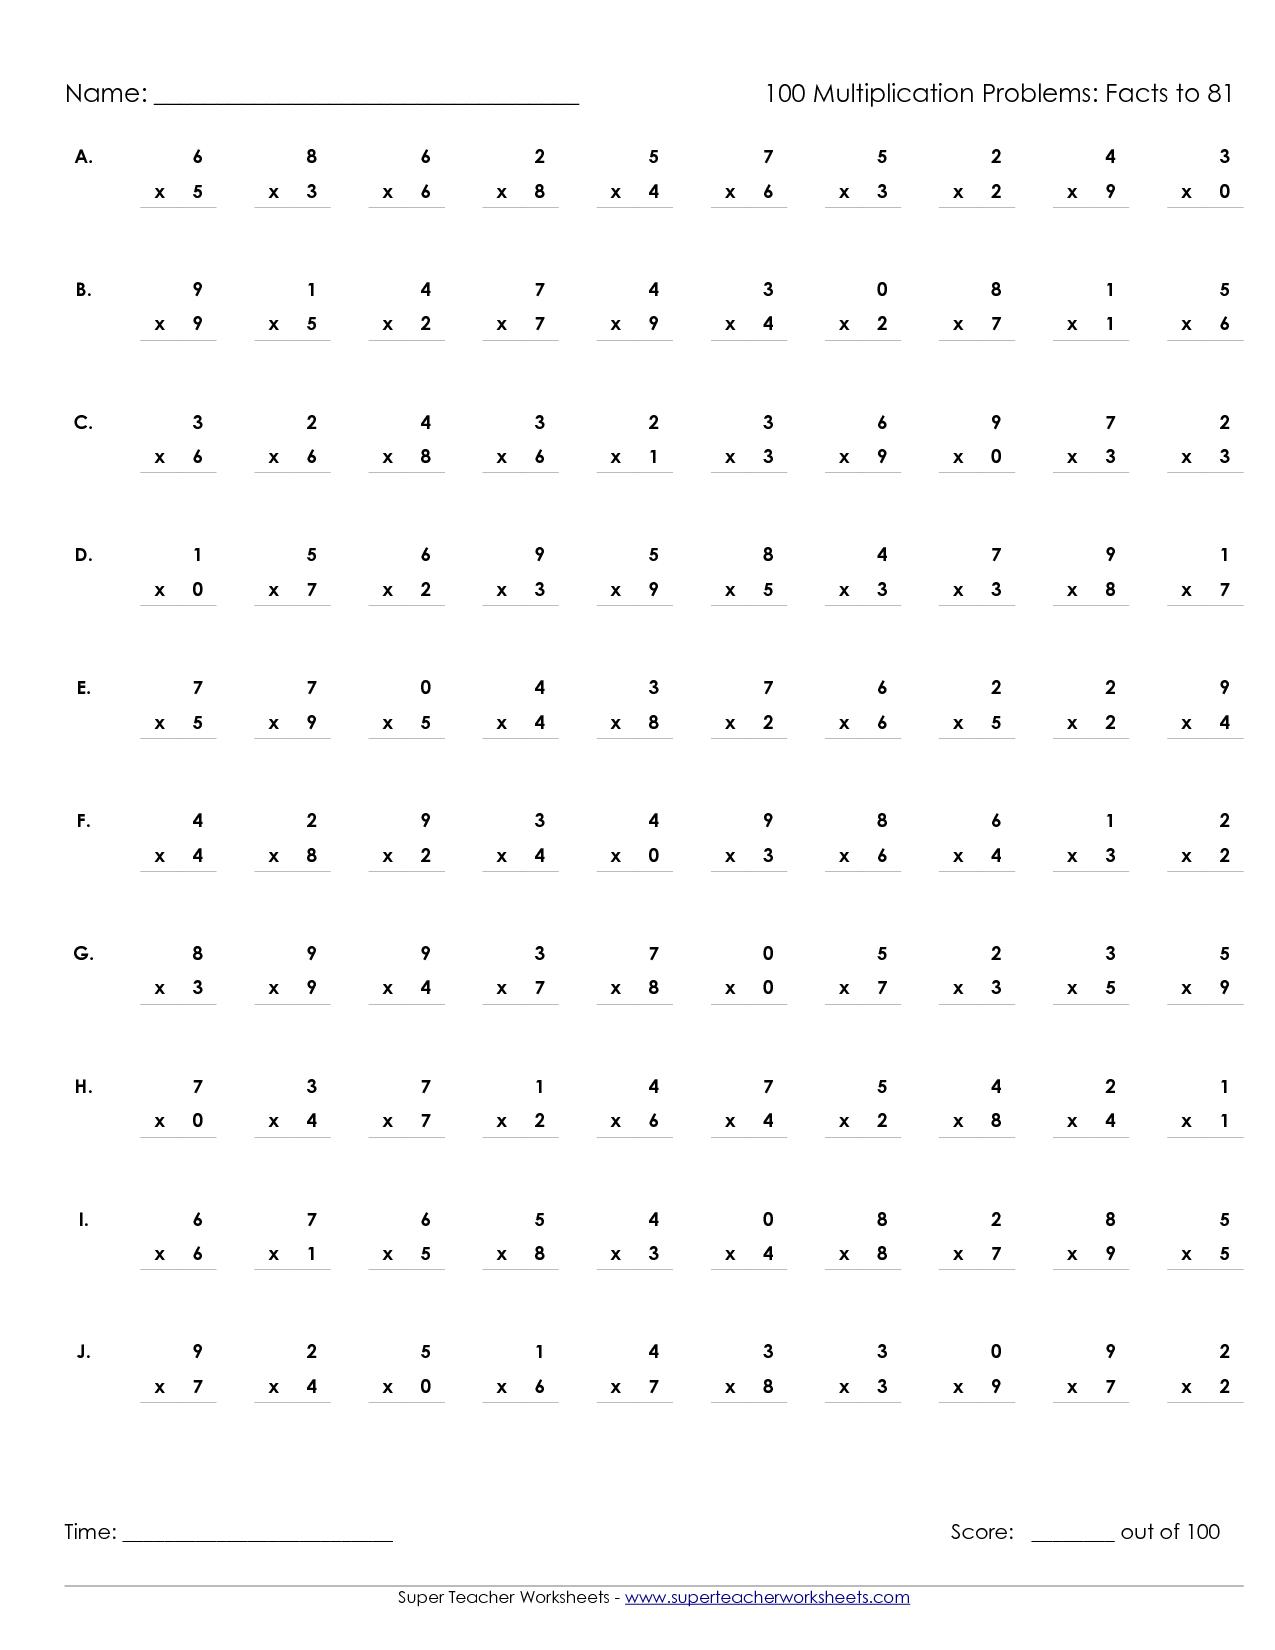 Printable Multiplication Worksheets 100 Problems   Math' S - Free Printable Multiplication Worksheets 100 Problems